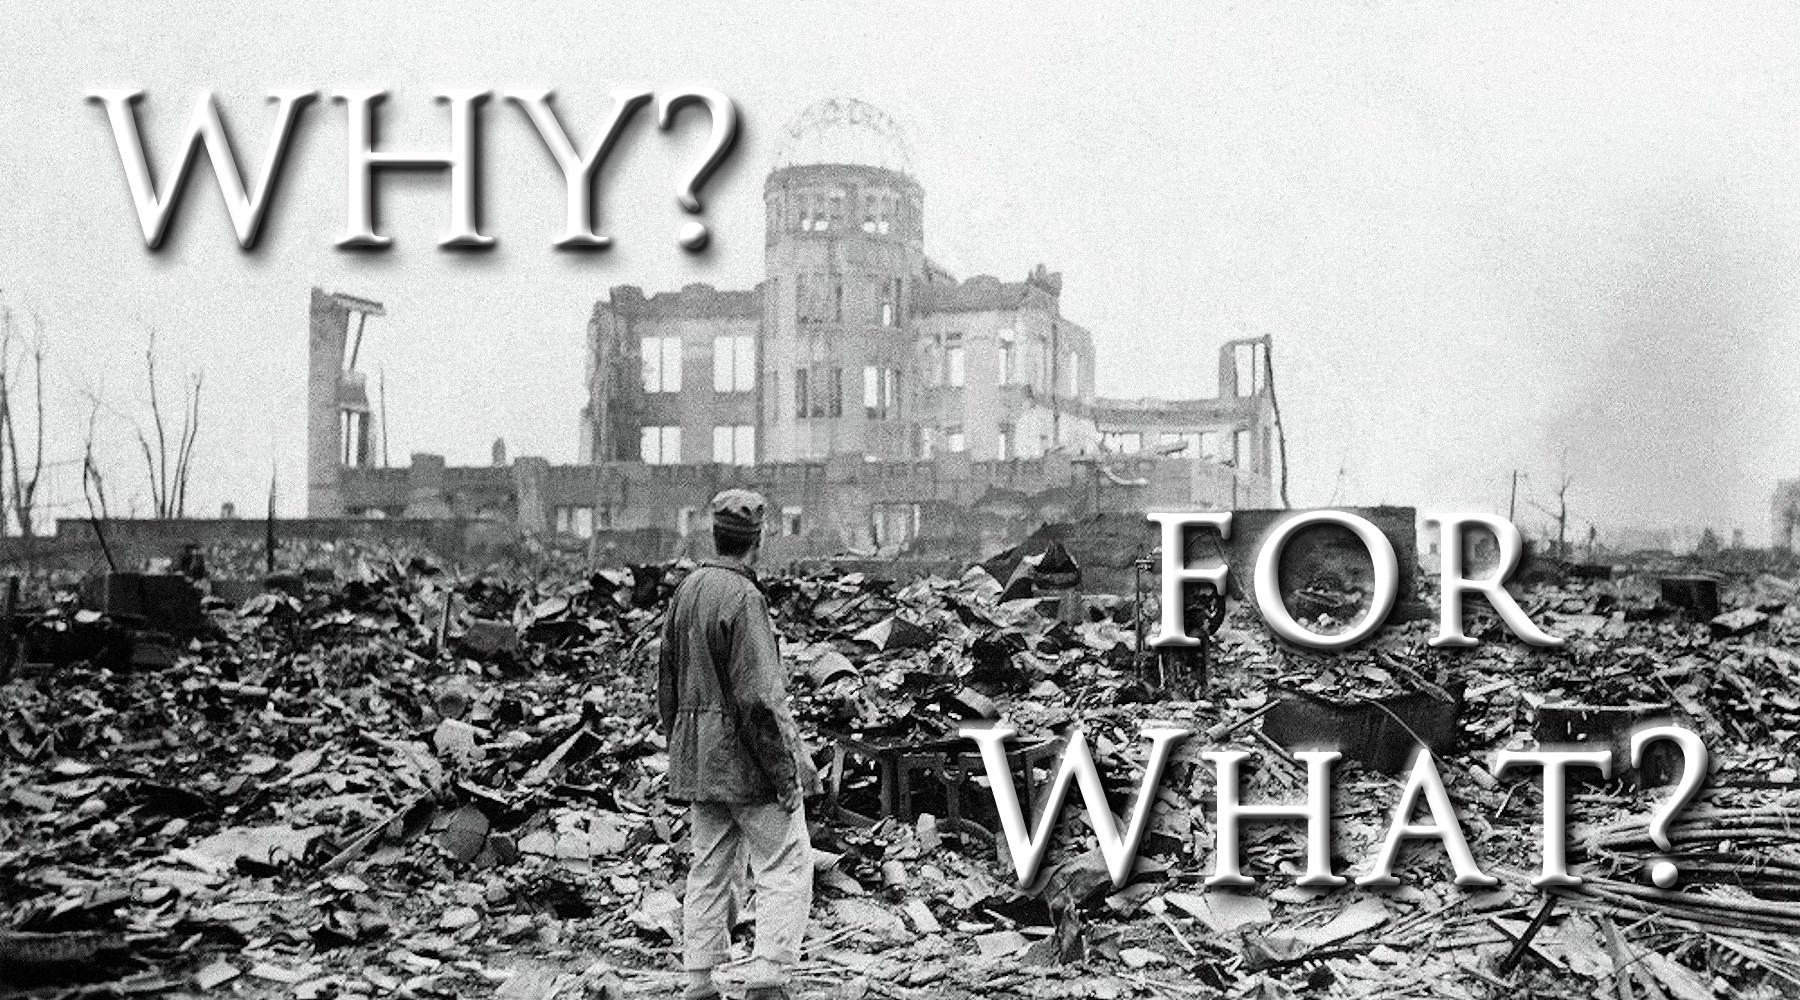 00 Hiroshima Japan 1945. 090815